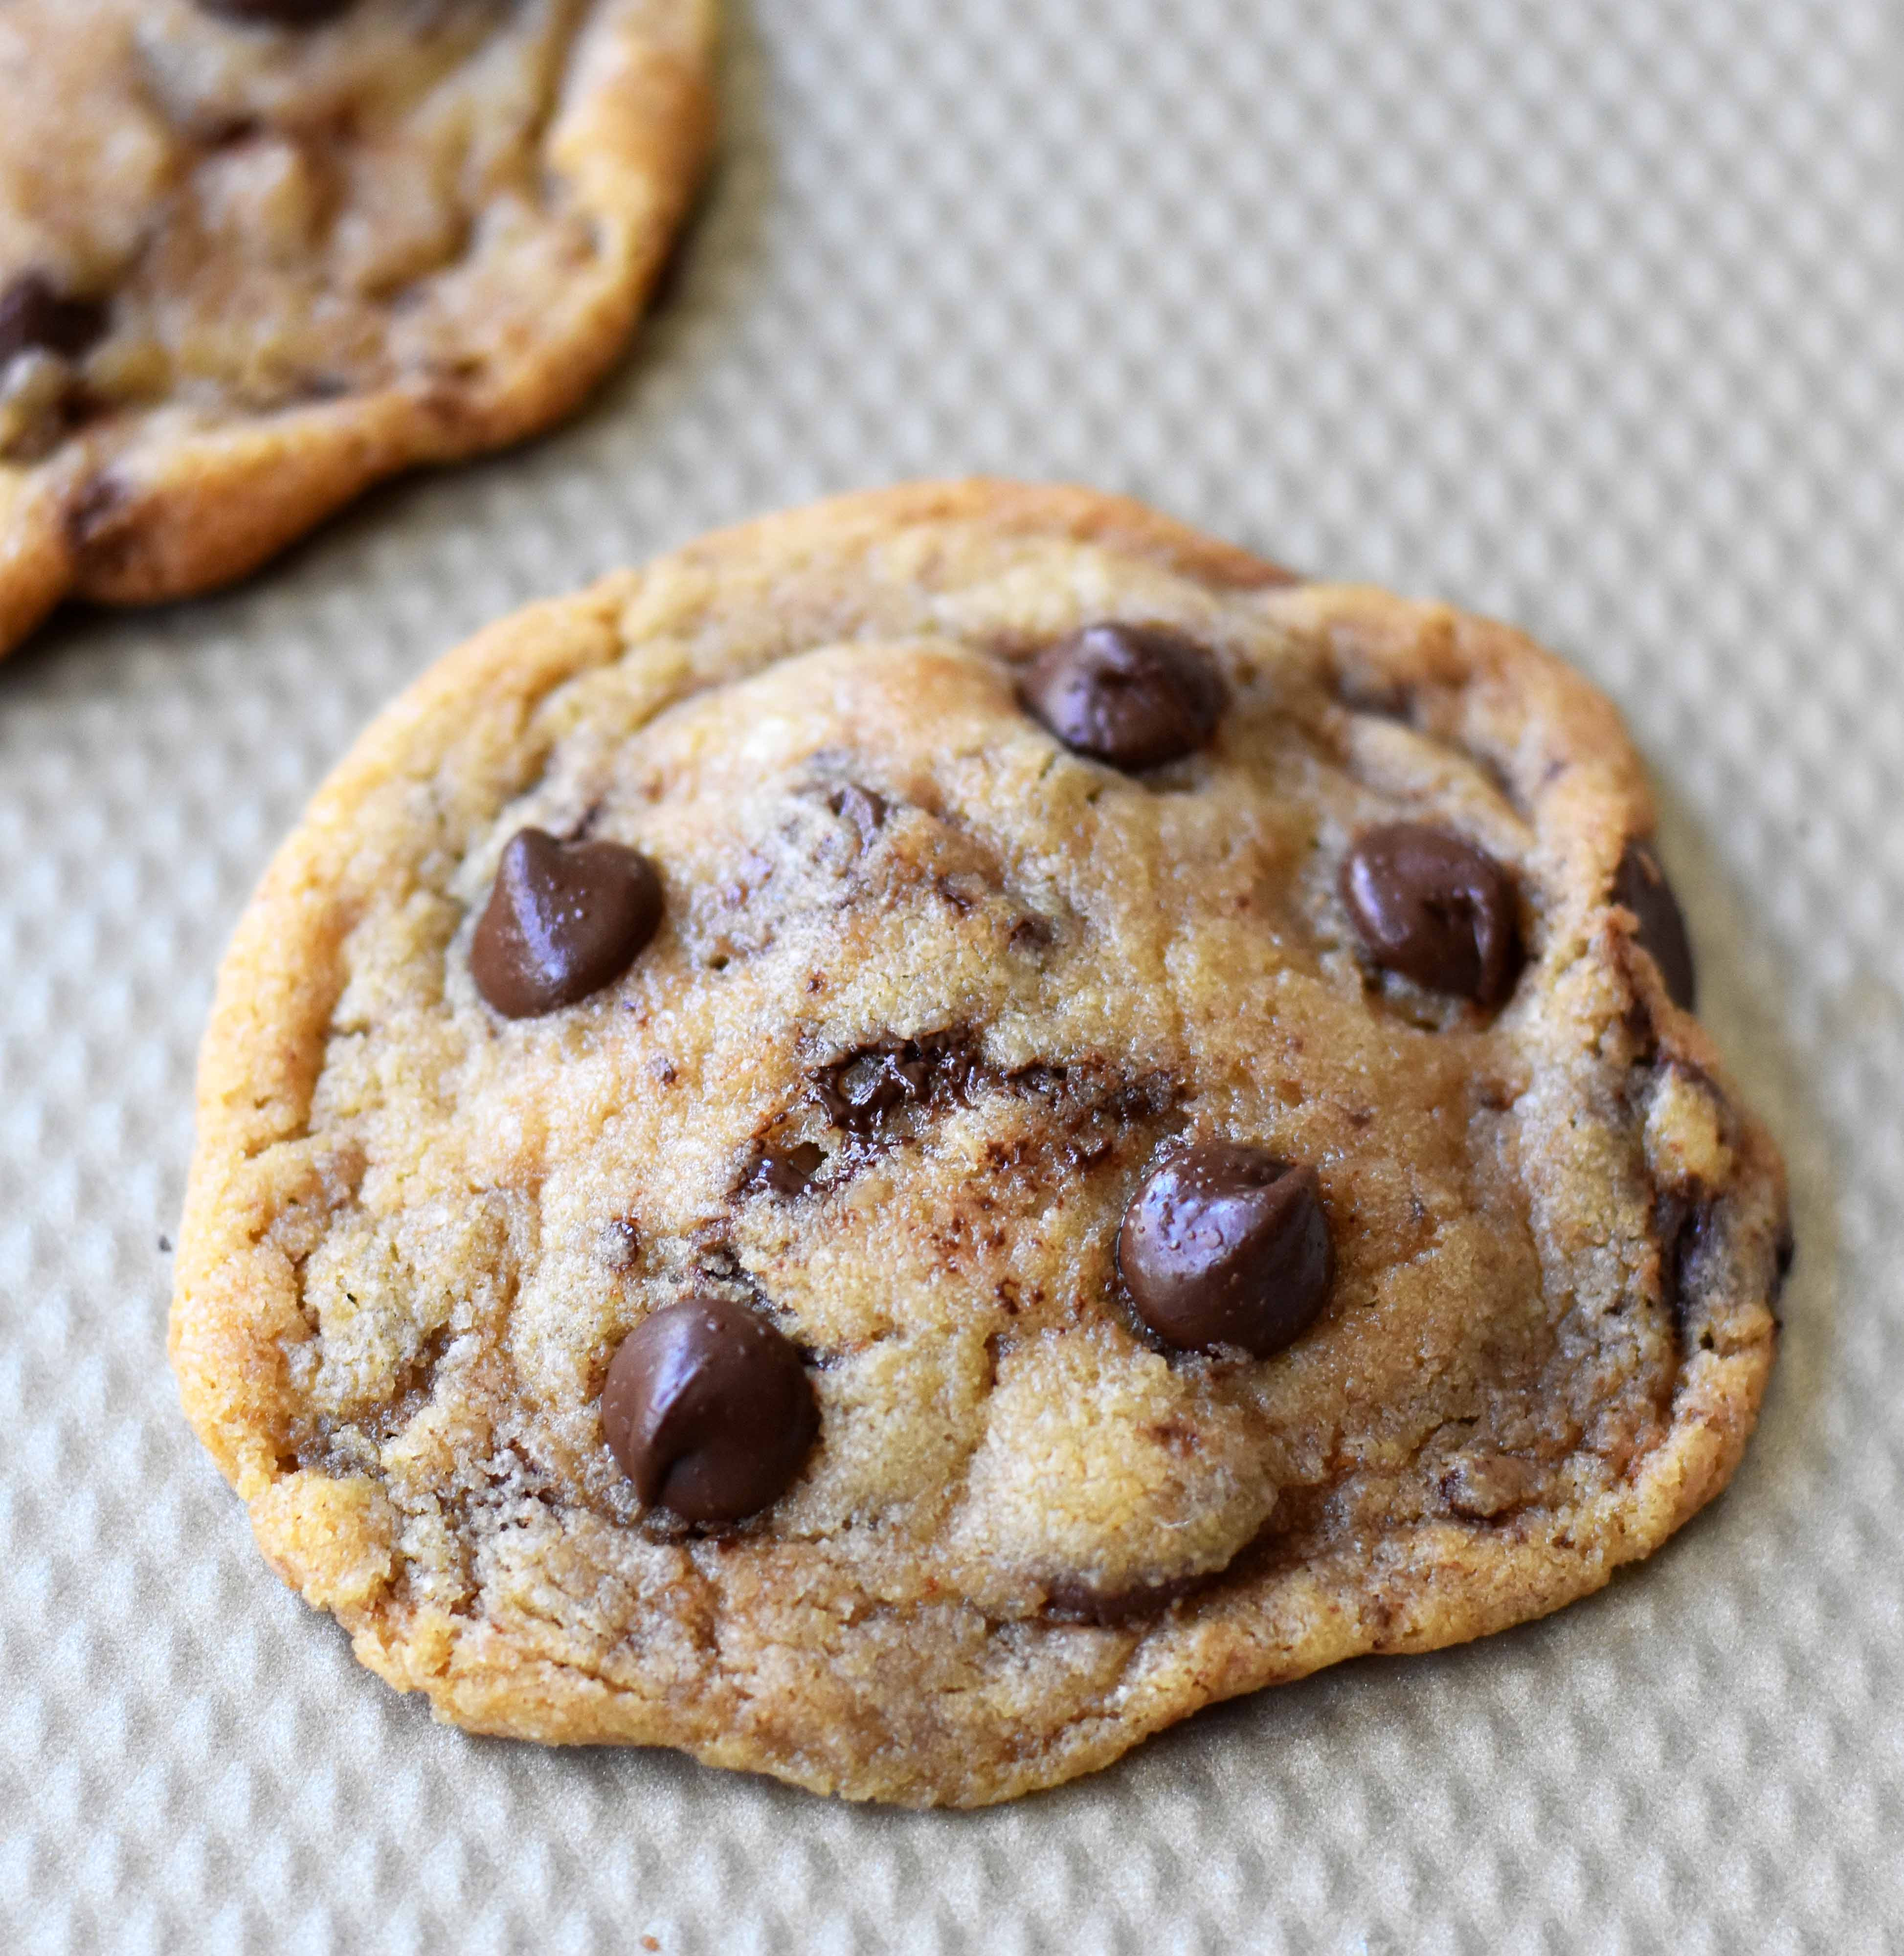 Crispy Chocolate Chip Cookies  Thin and Crispy Chocolate Chip Cookies